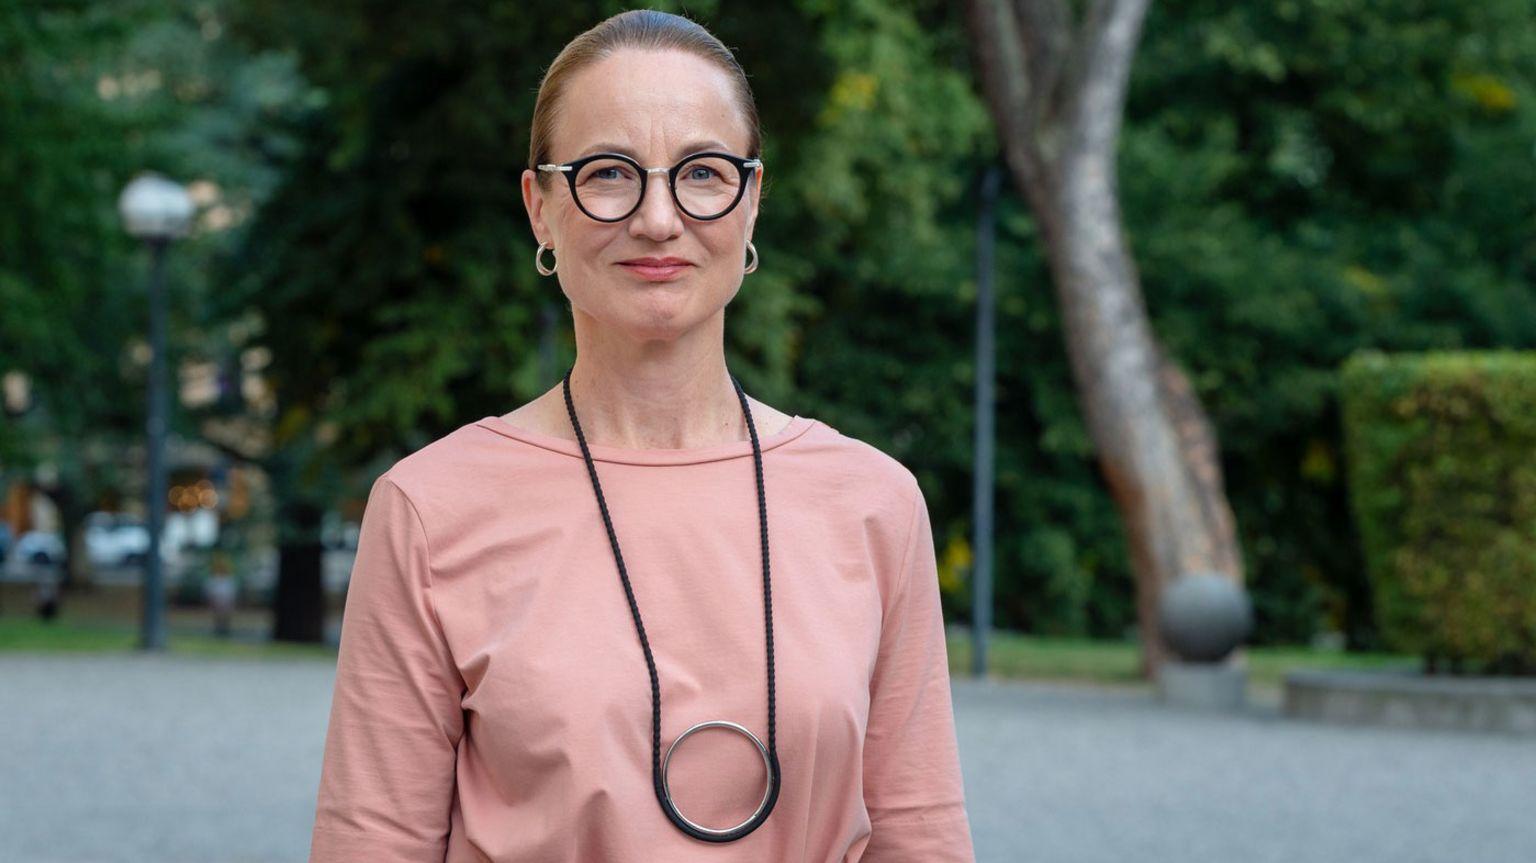 Cancerfondens generalsekreterare Ulrika Årehed Kågström i rosa klänning med en grön lummig bakgrund.